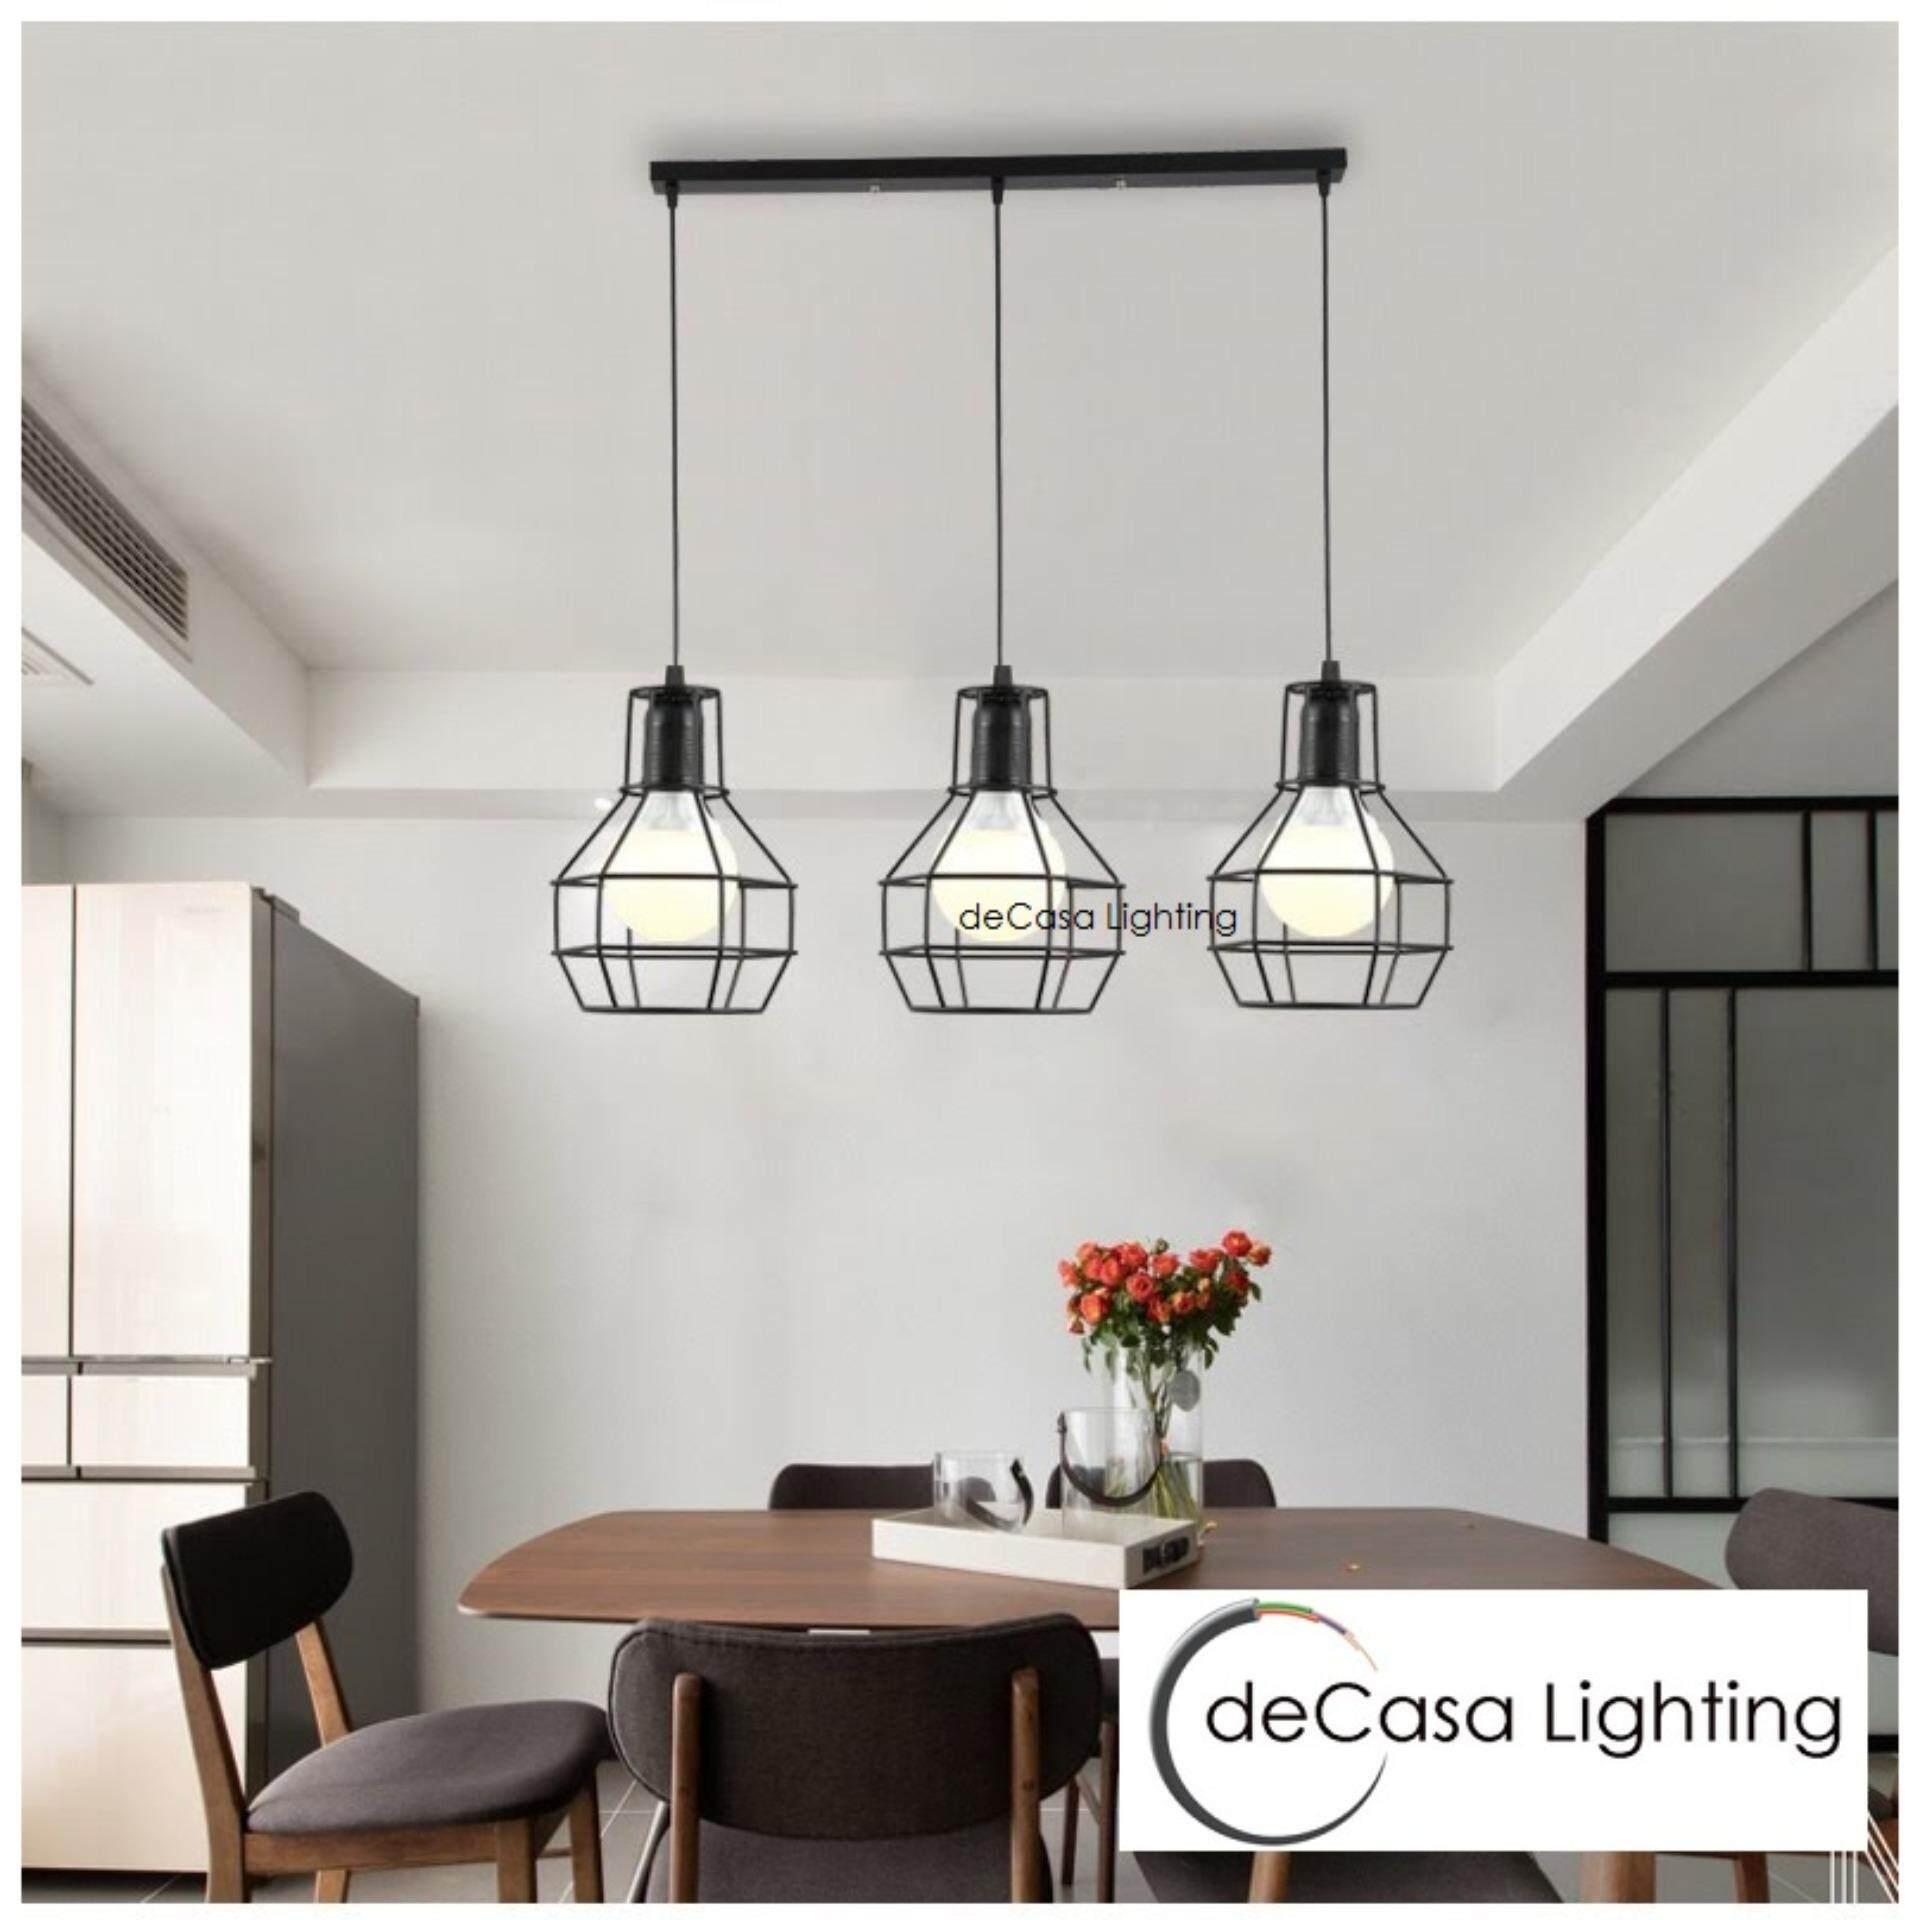 Ceiling lights pendants light long base decasa lighting designer decorative ceiling lights pendants light set of 3black loft designer decorative decasa